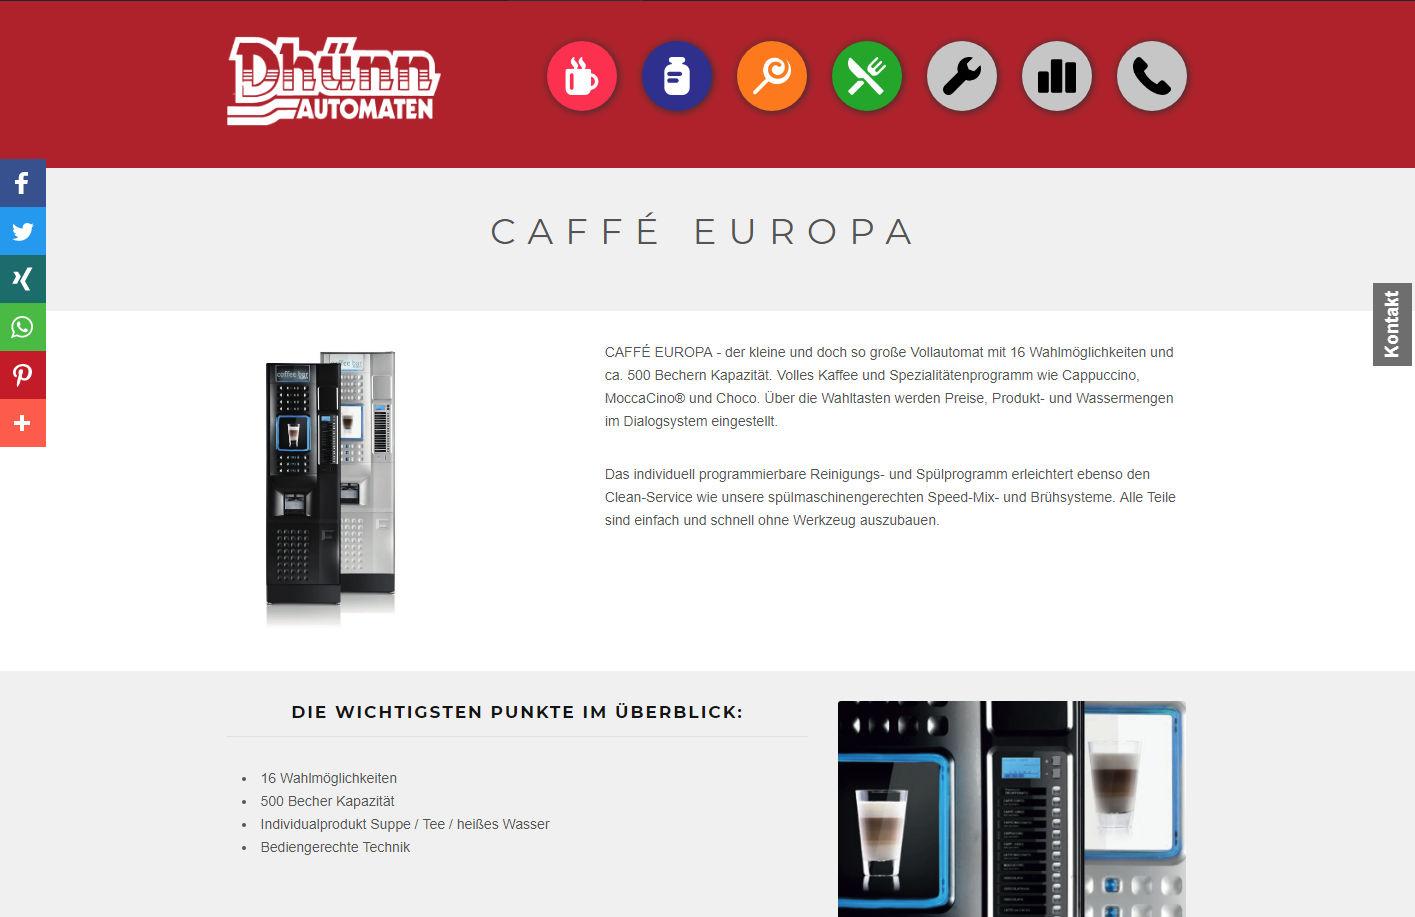 vor europawahl: gericht verbietet wahl-o-mat. Aber verboten grosse auswahl an automaten und gerichten, z.B. Caffe EUROPA